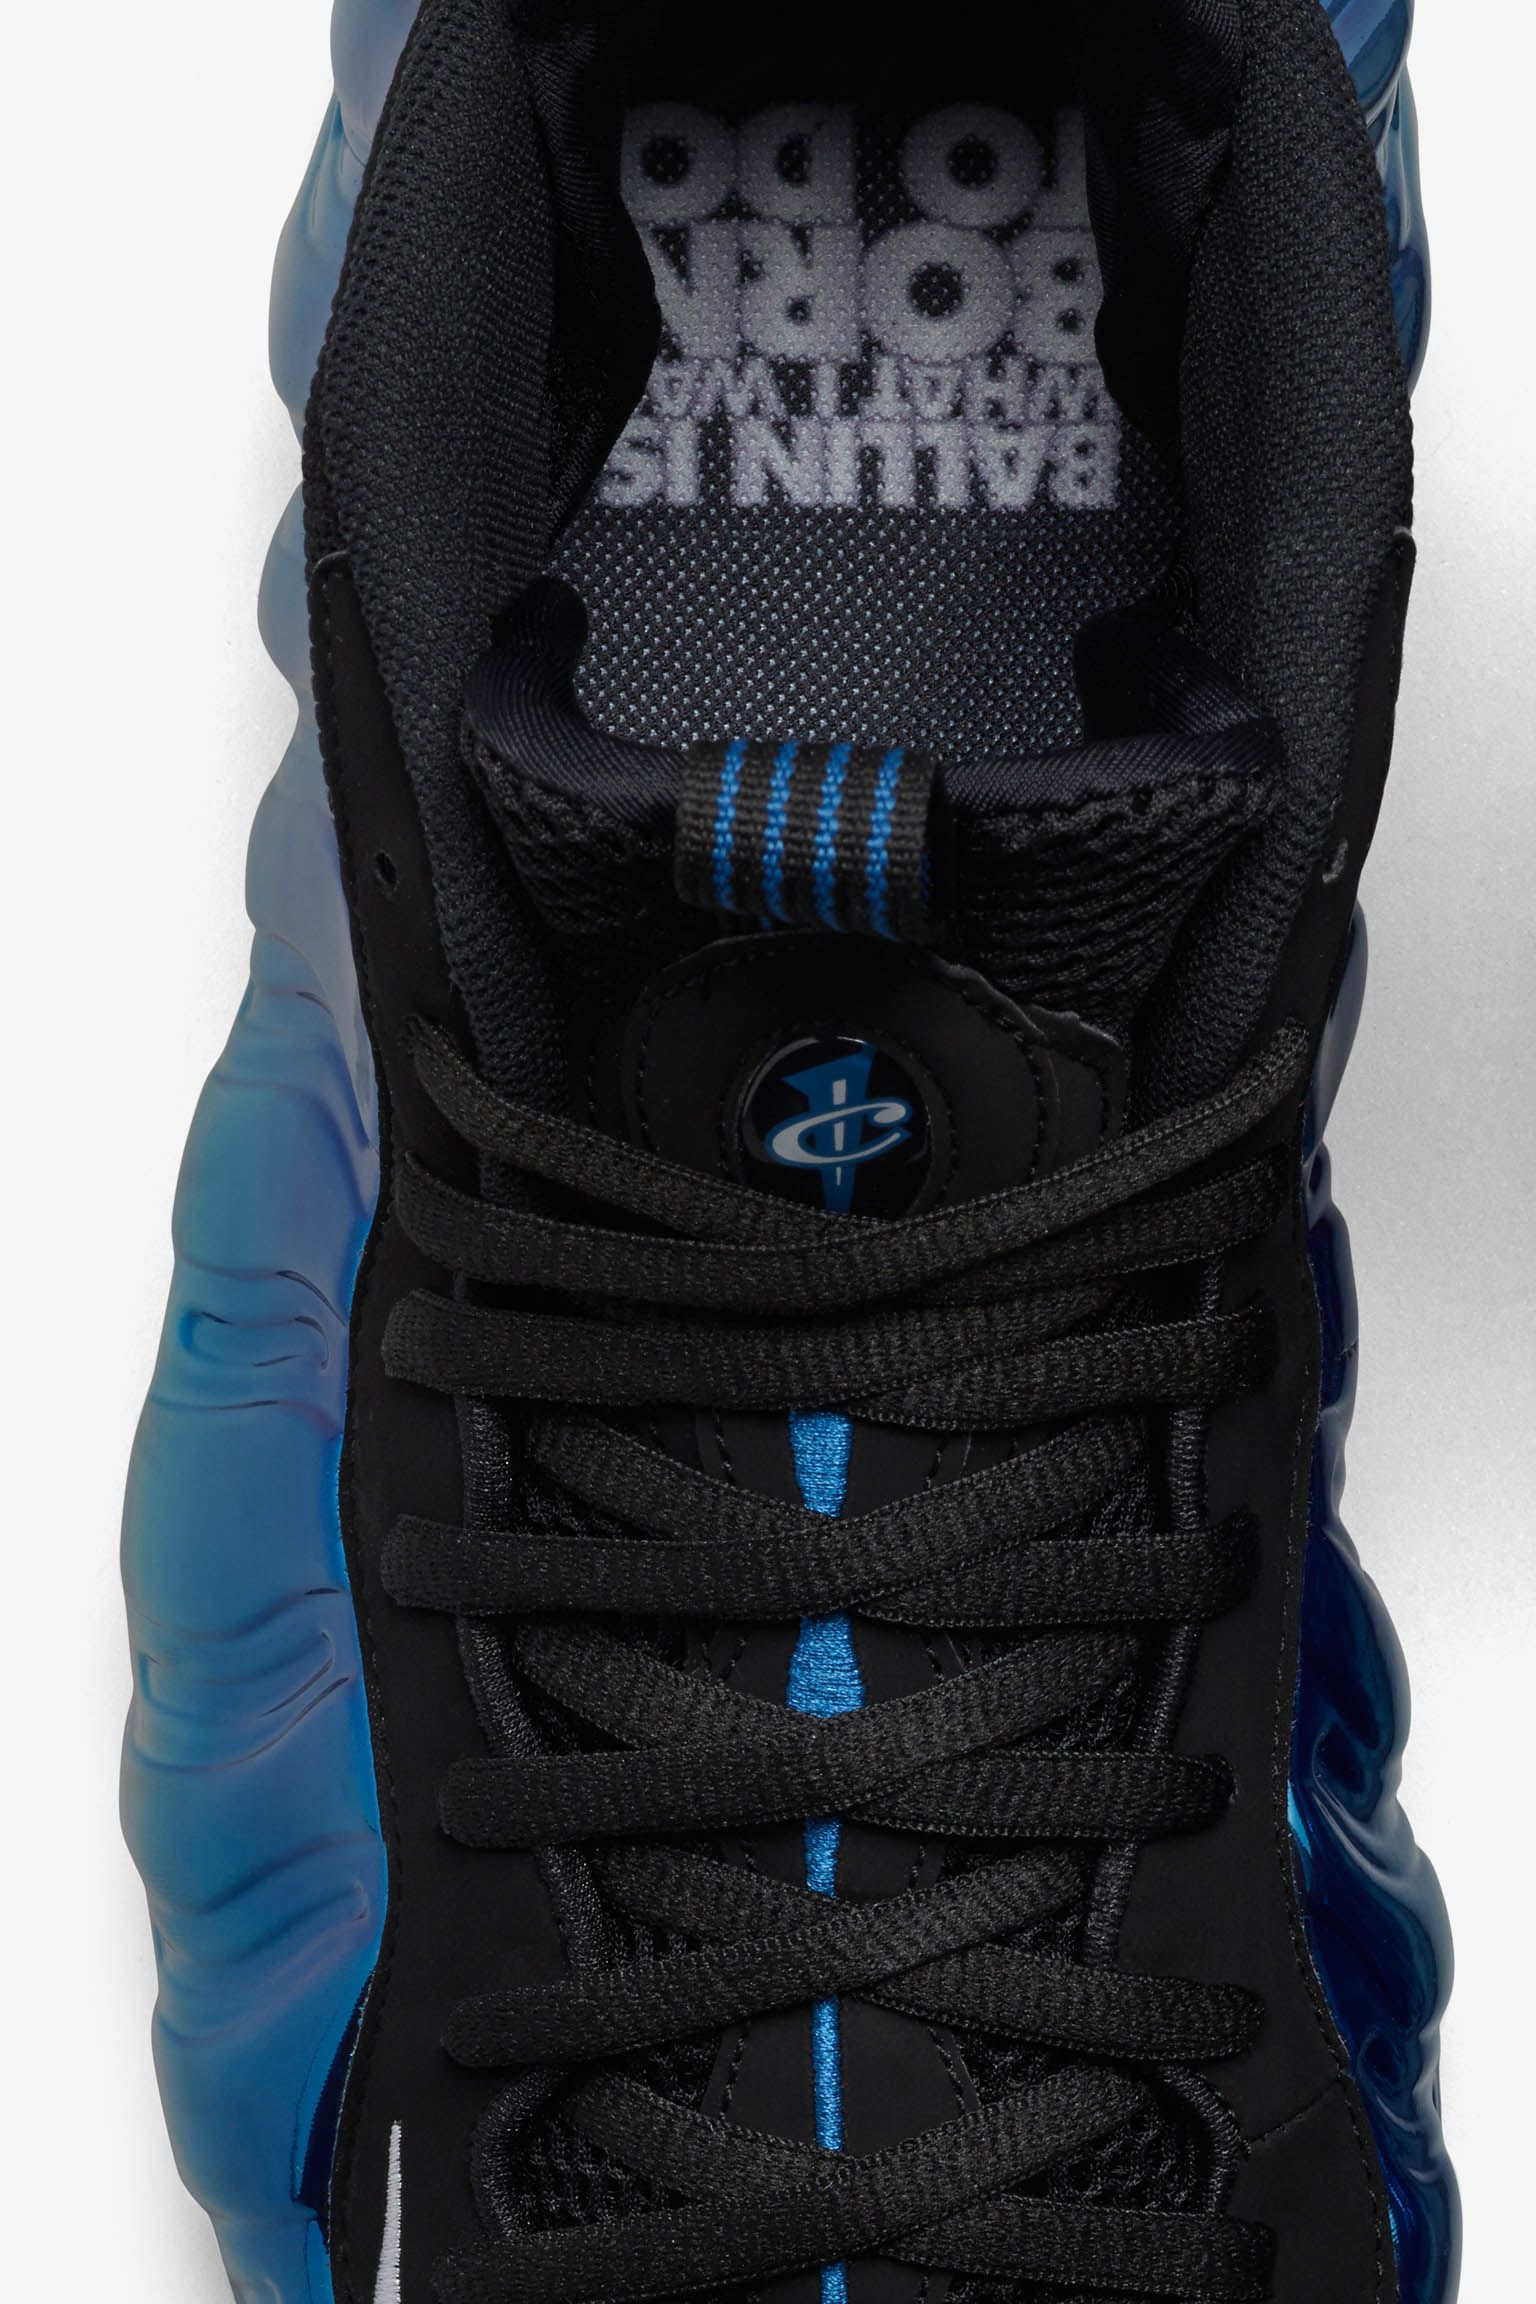 Nike Air Foamposite One 'Blue Mirror' Release Date